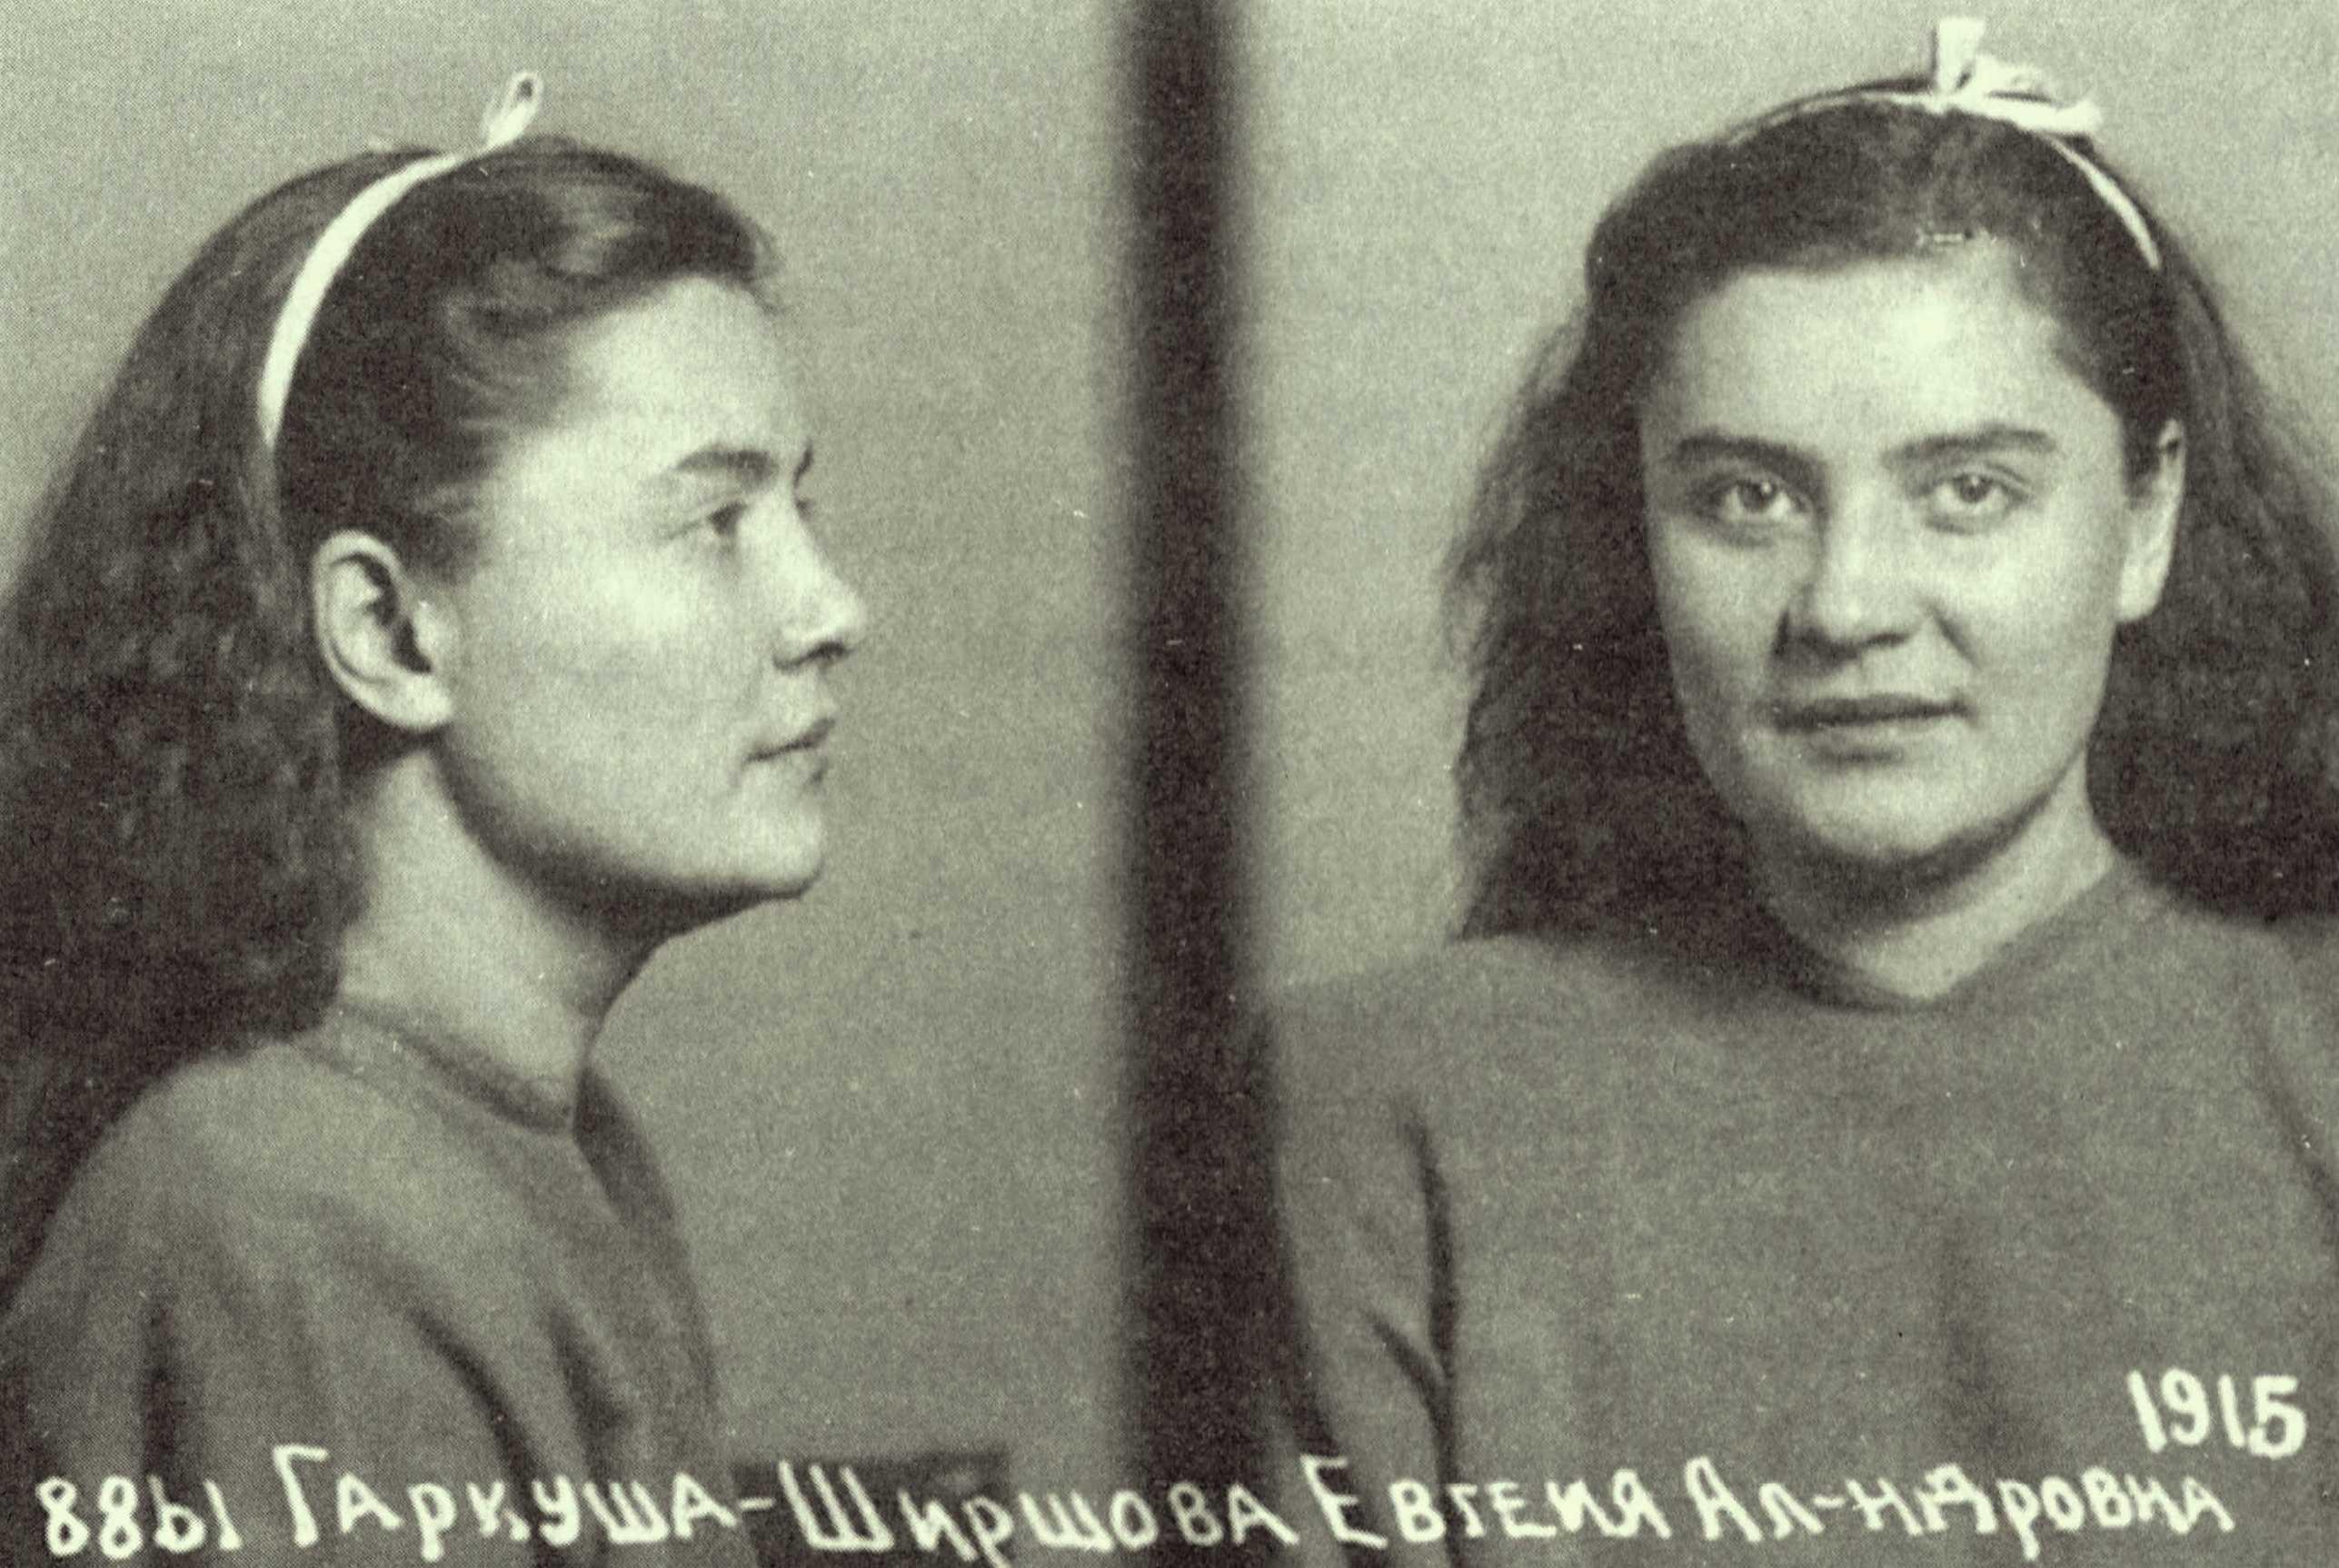 http://bessmertnybarak.ru/files/2/images/bez_fotoshopa/ludi_i_sudbi/akteri/garkusha/2.jpeg